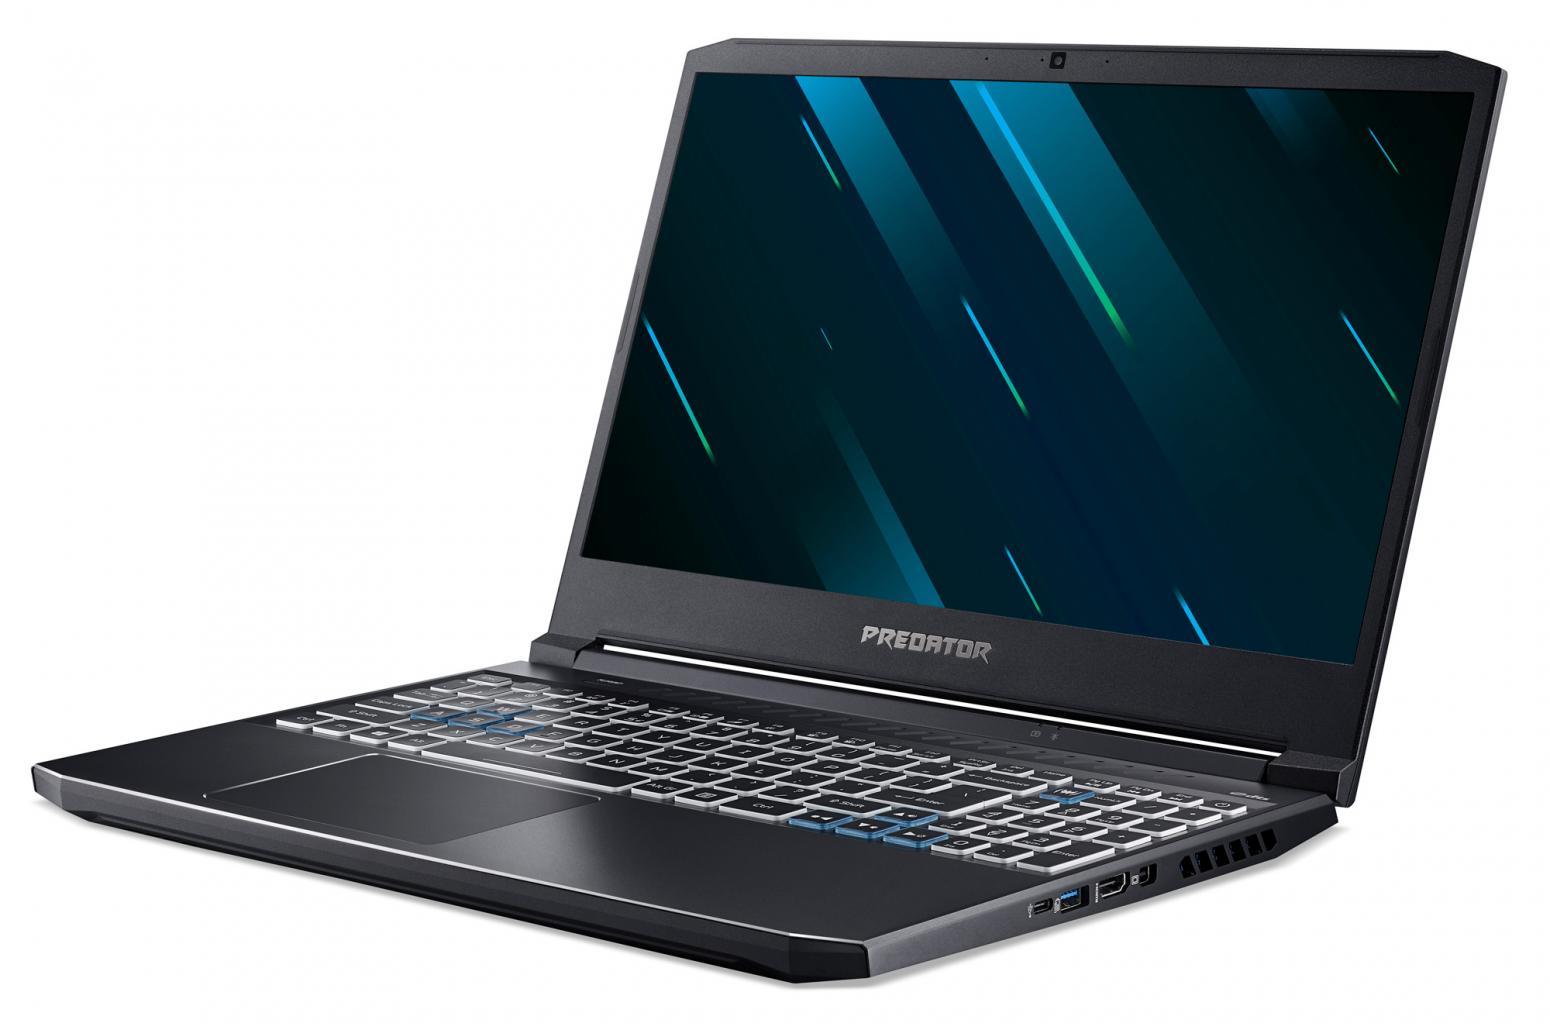 Ordinateur portable Acer Predator Helios PH315-53-70A9 - RTX 3080, 144Hz - photo 5